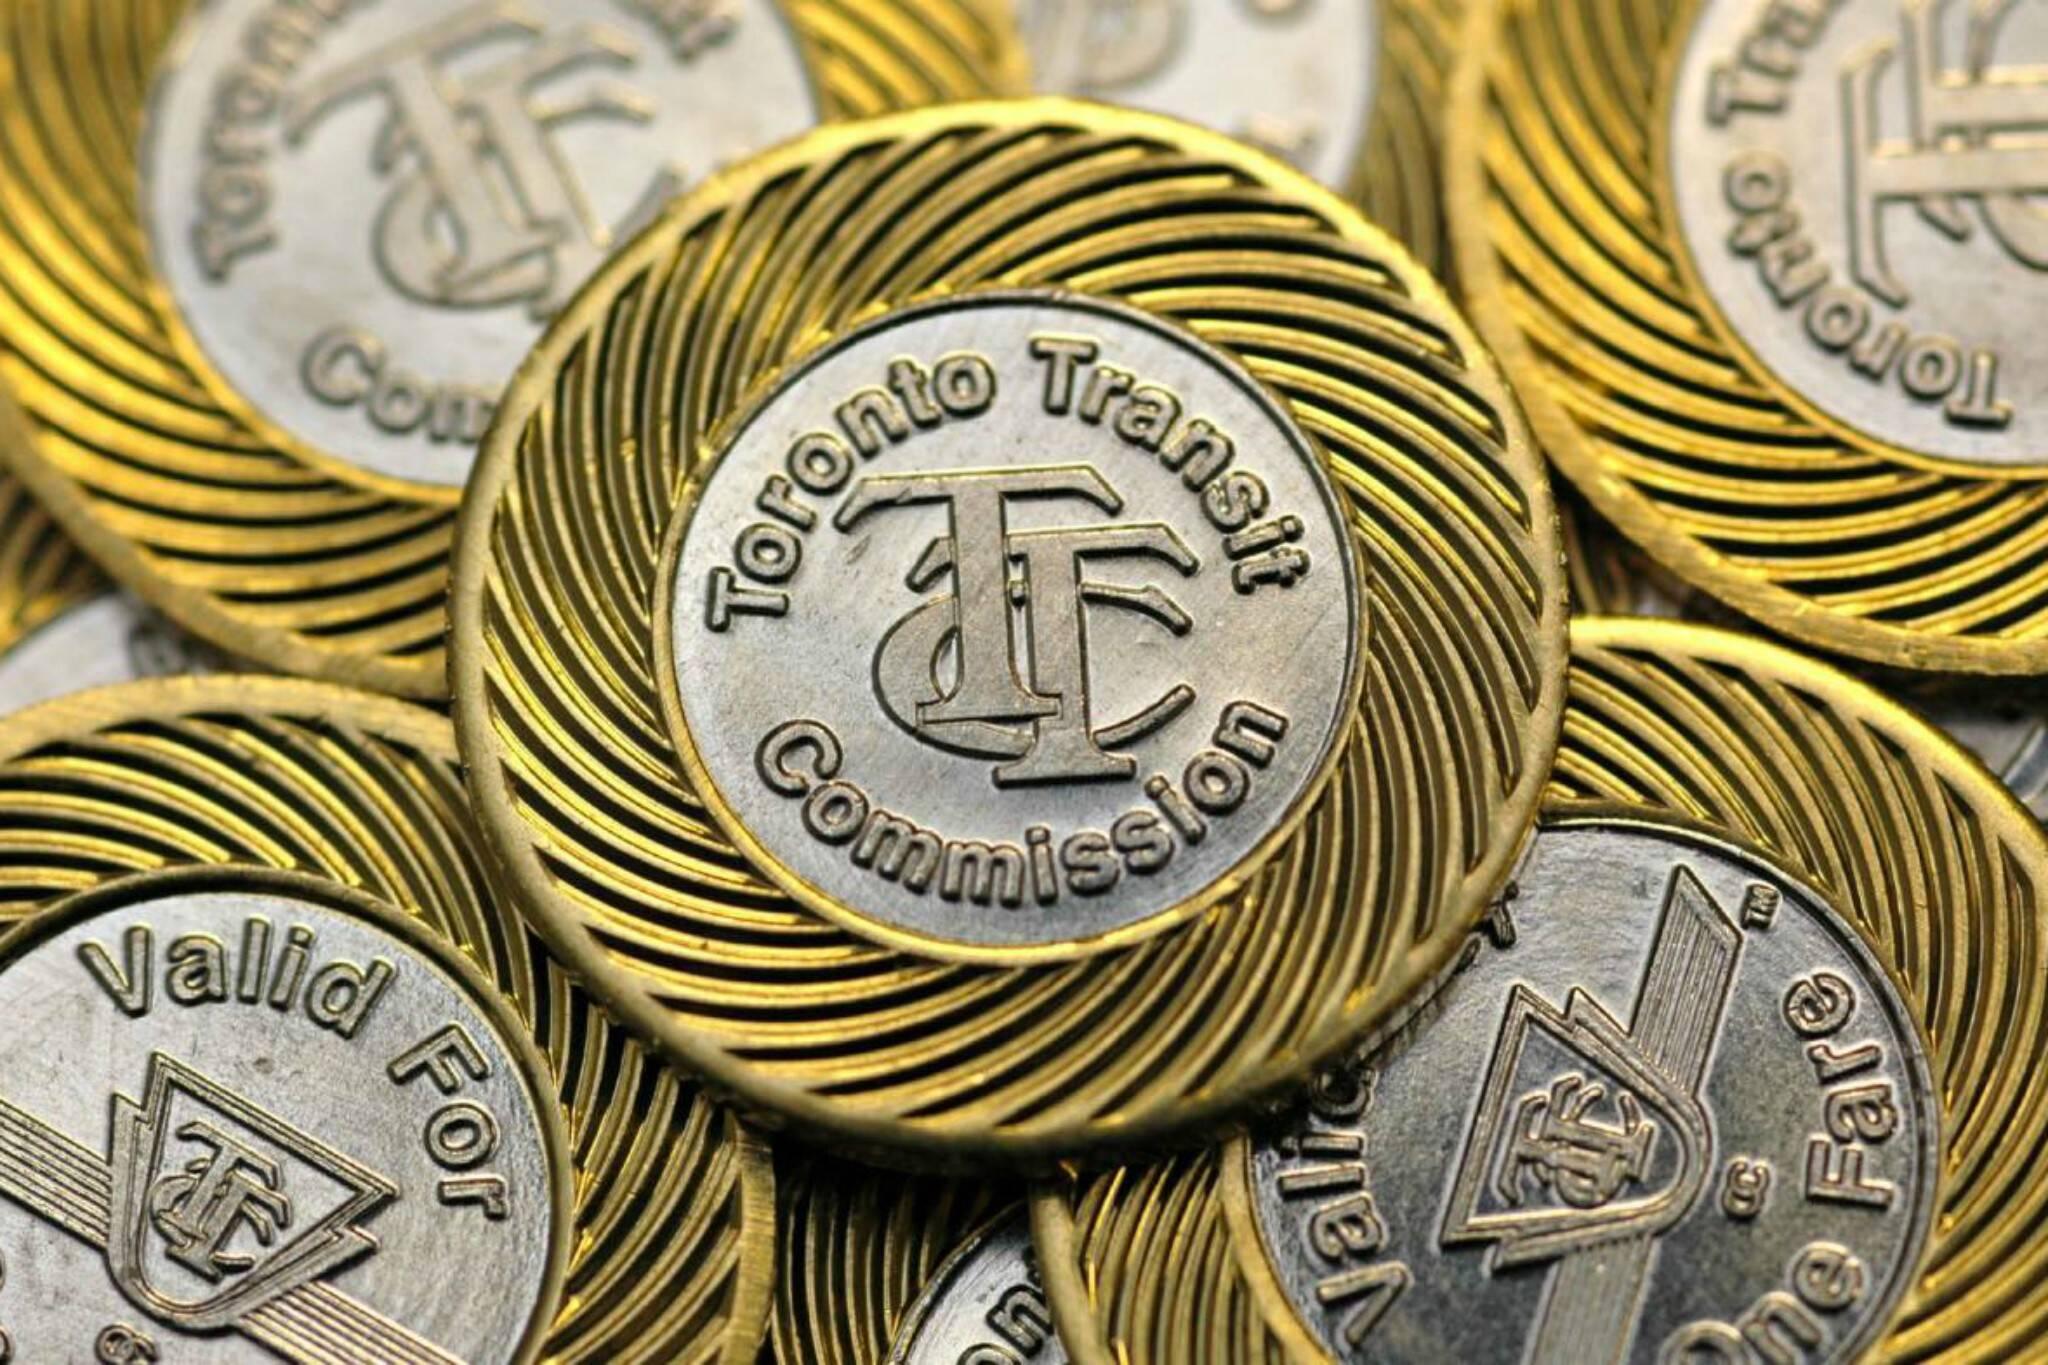 ttc tokens toronto